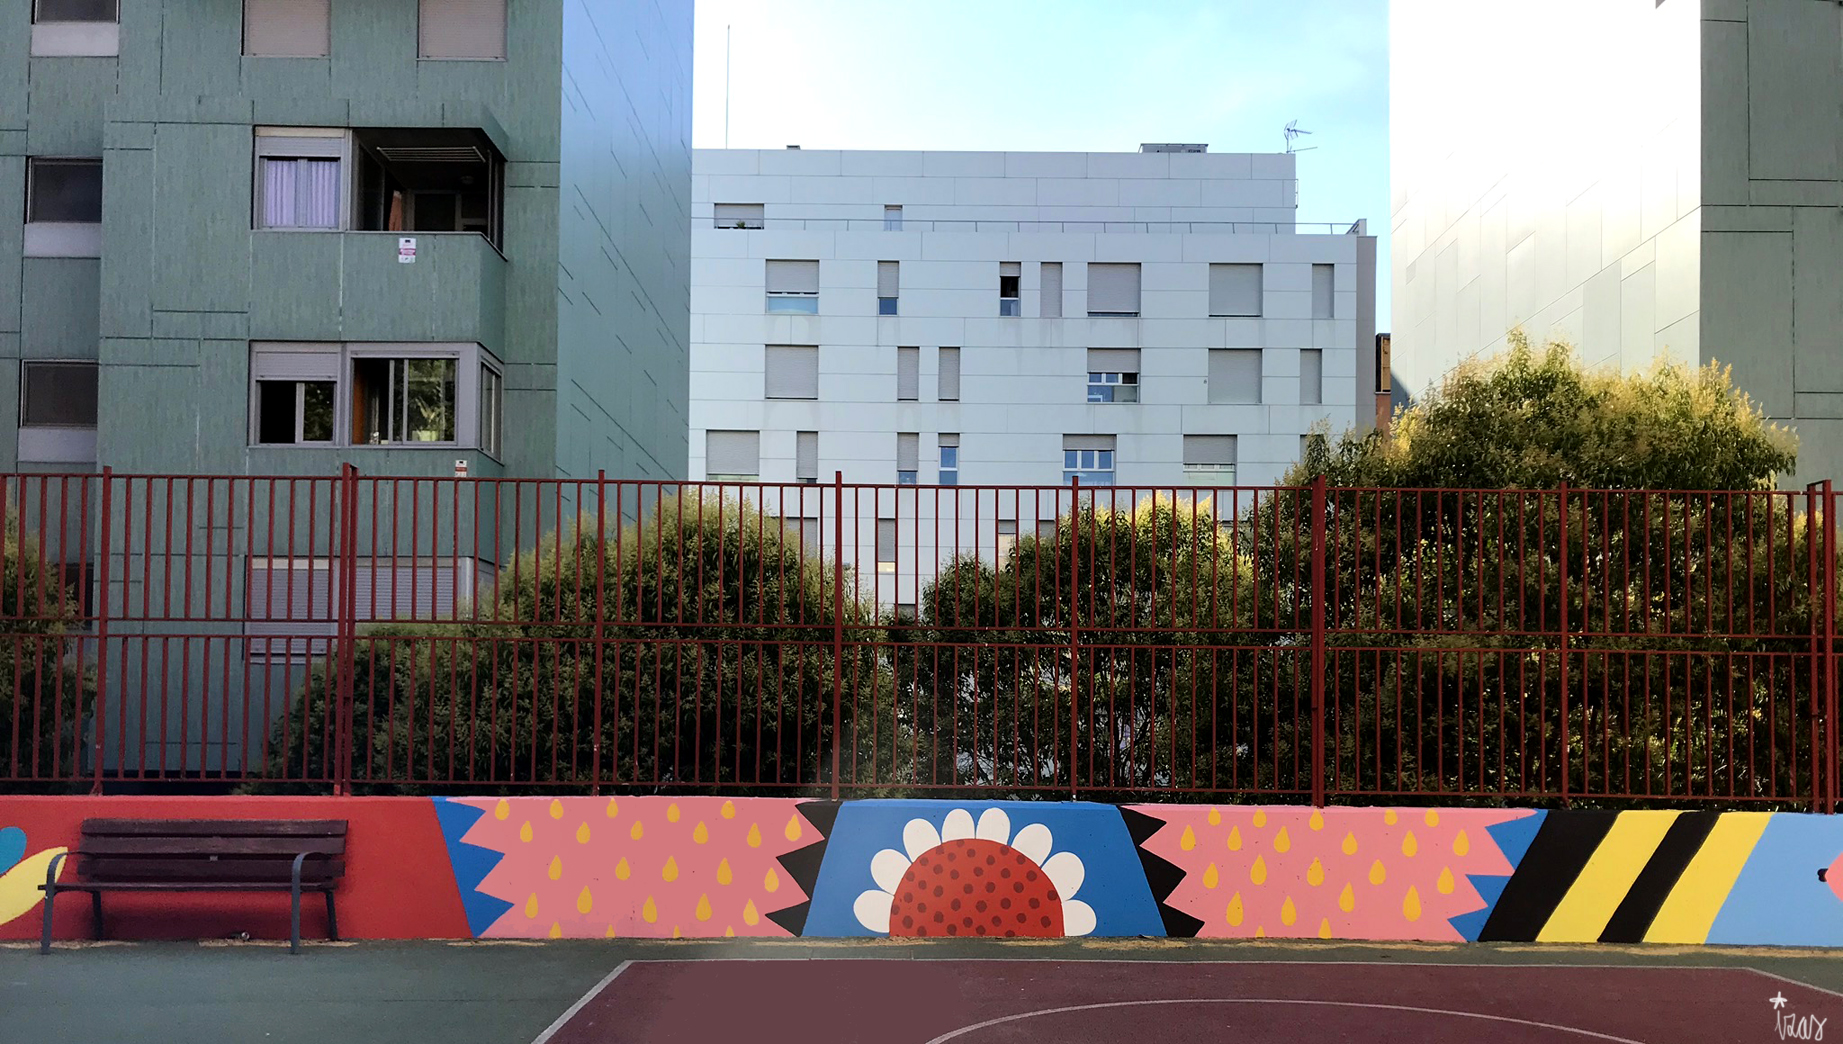 mural izas azulpatio ceip eduardo rojo patio detalle 19